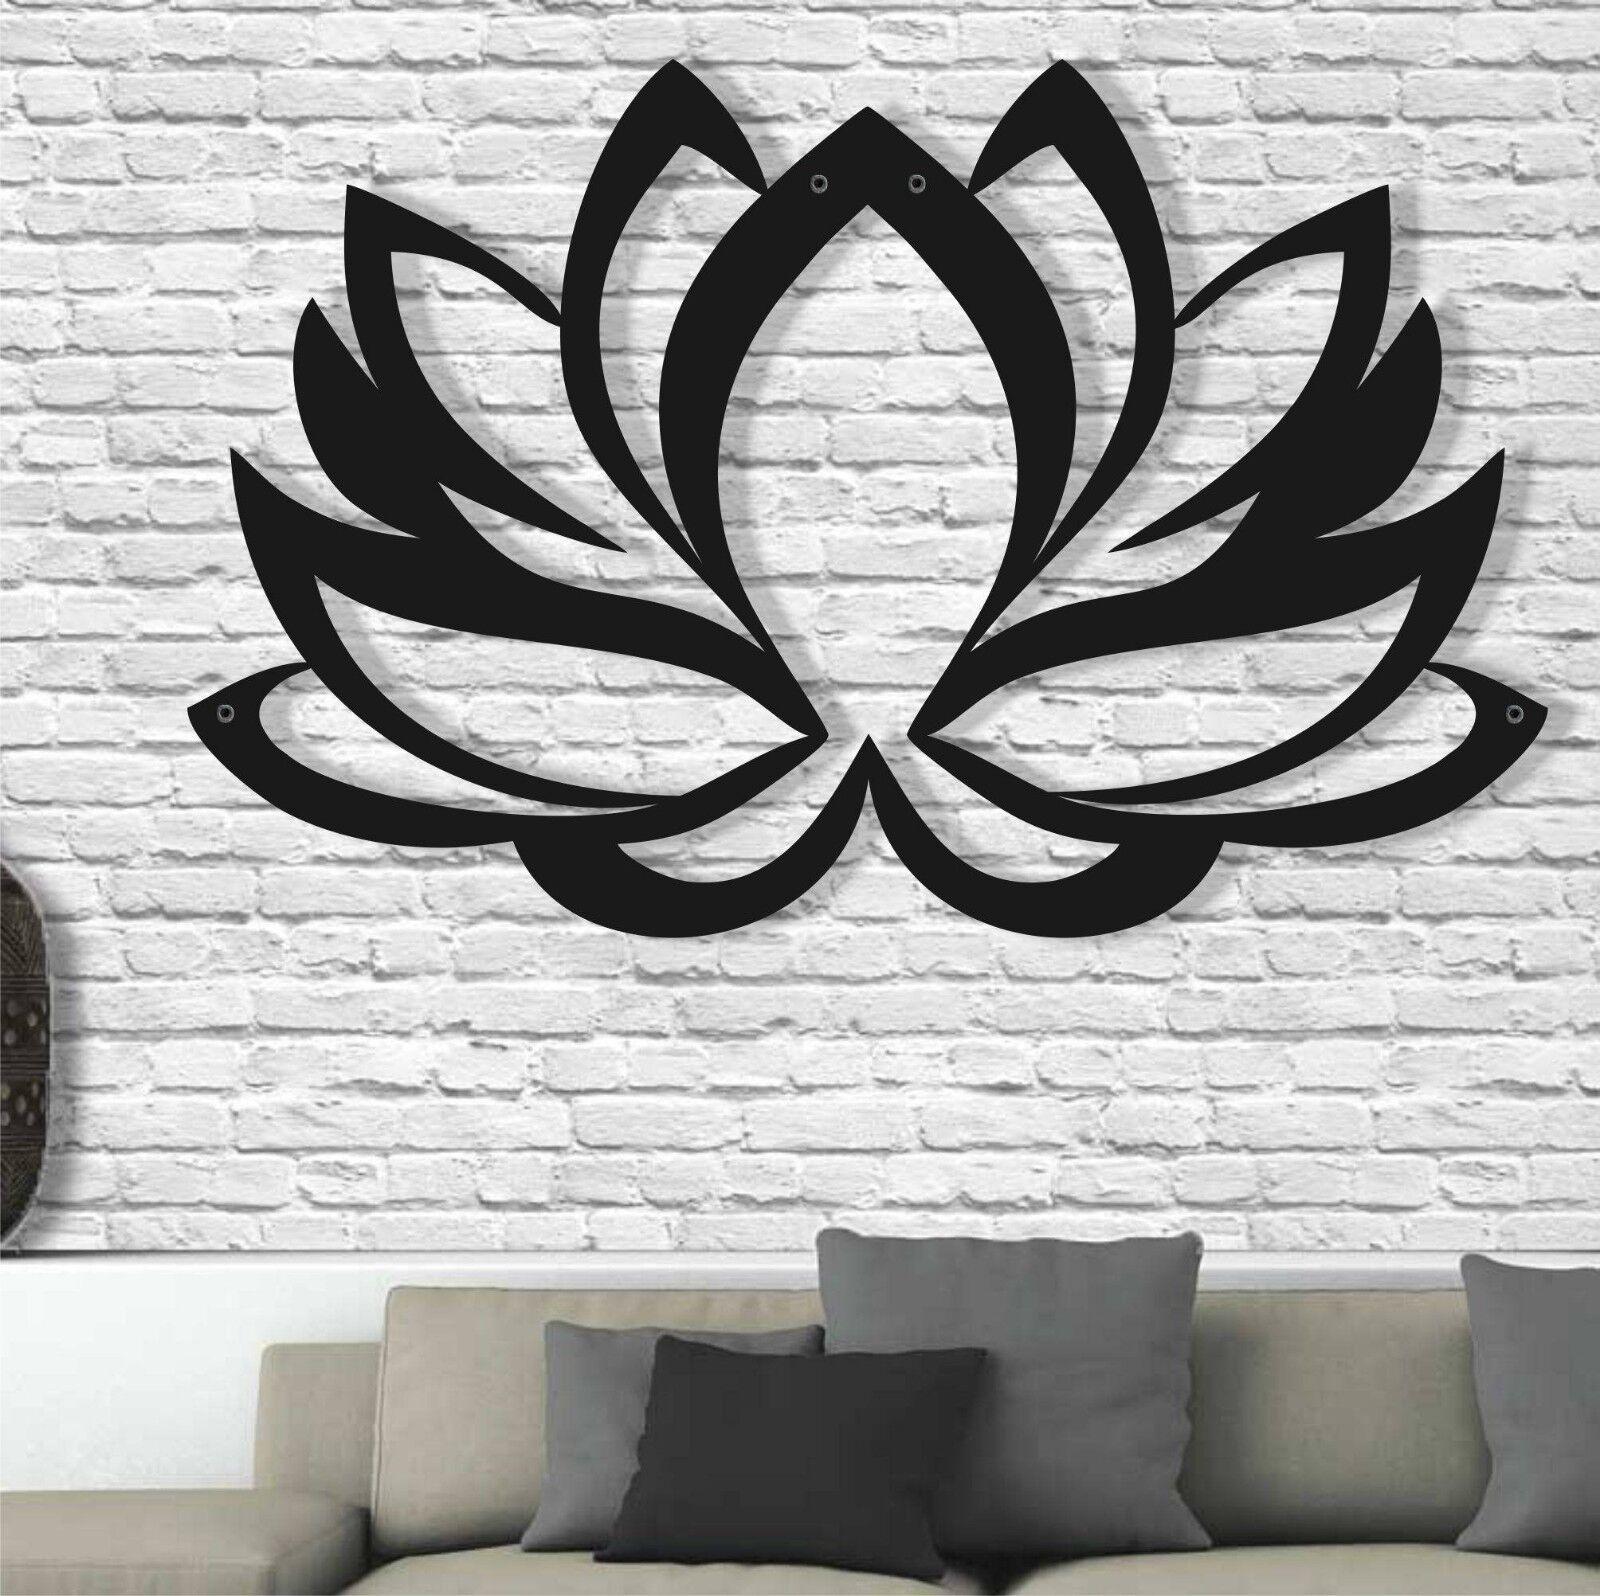 Fleur de Lotus METAL WALL ART 3D Mur Silhouette Metal Wall Decor Home Décoration